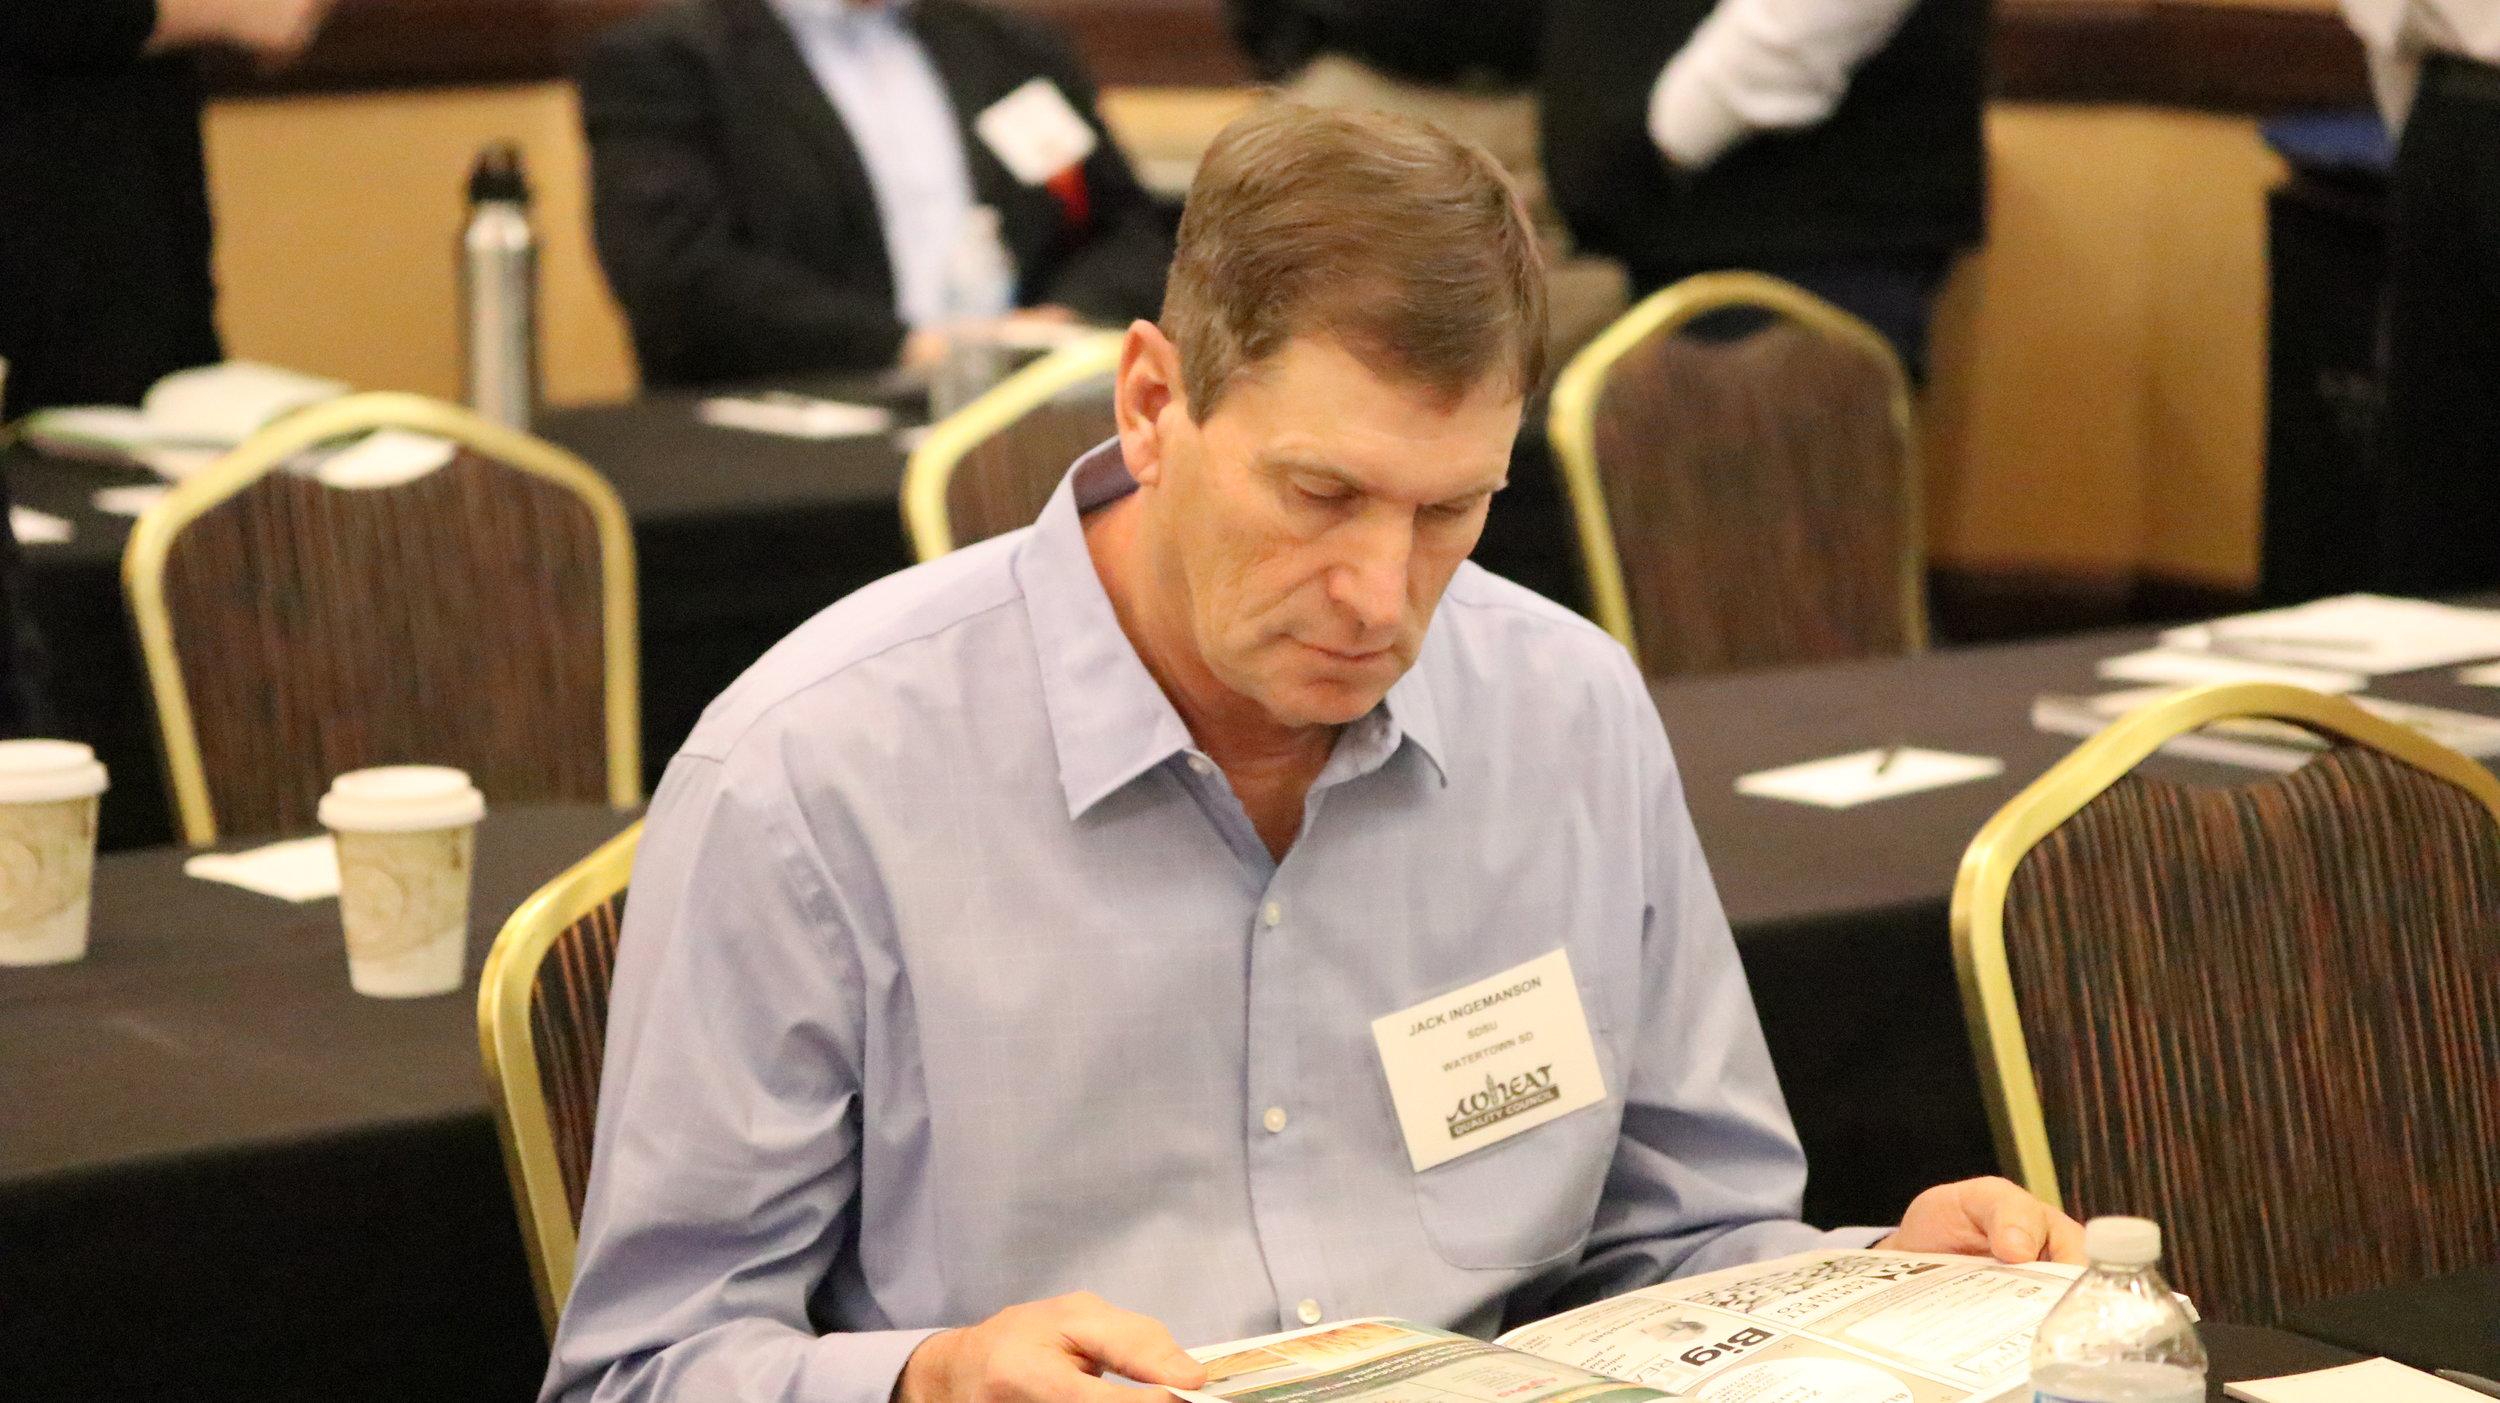 Jack Ingemanson, SDSU